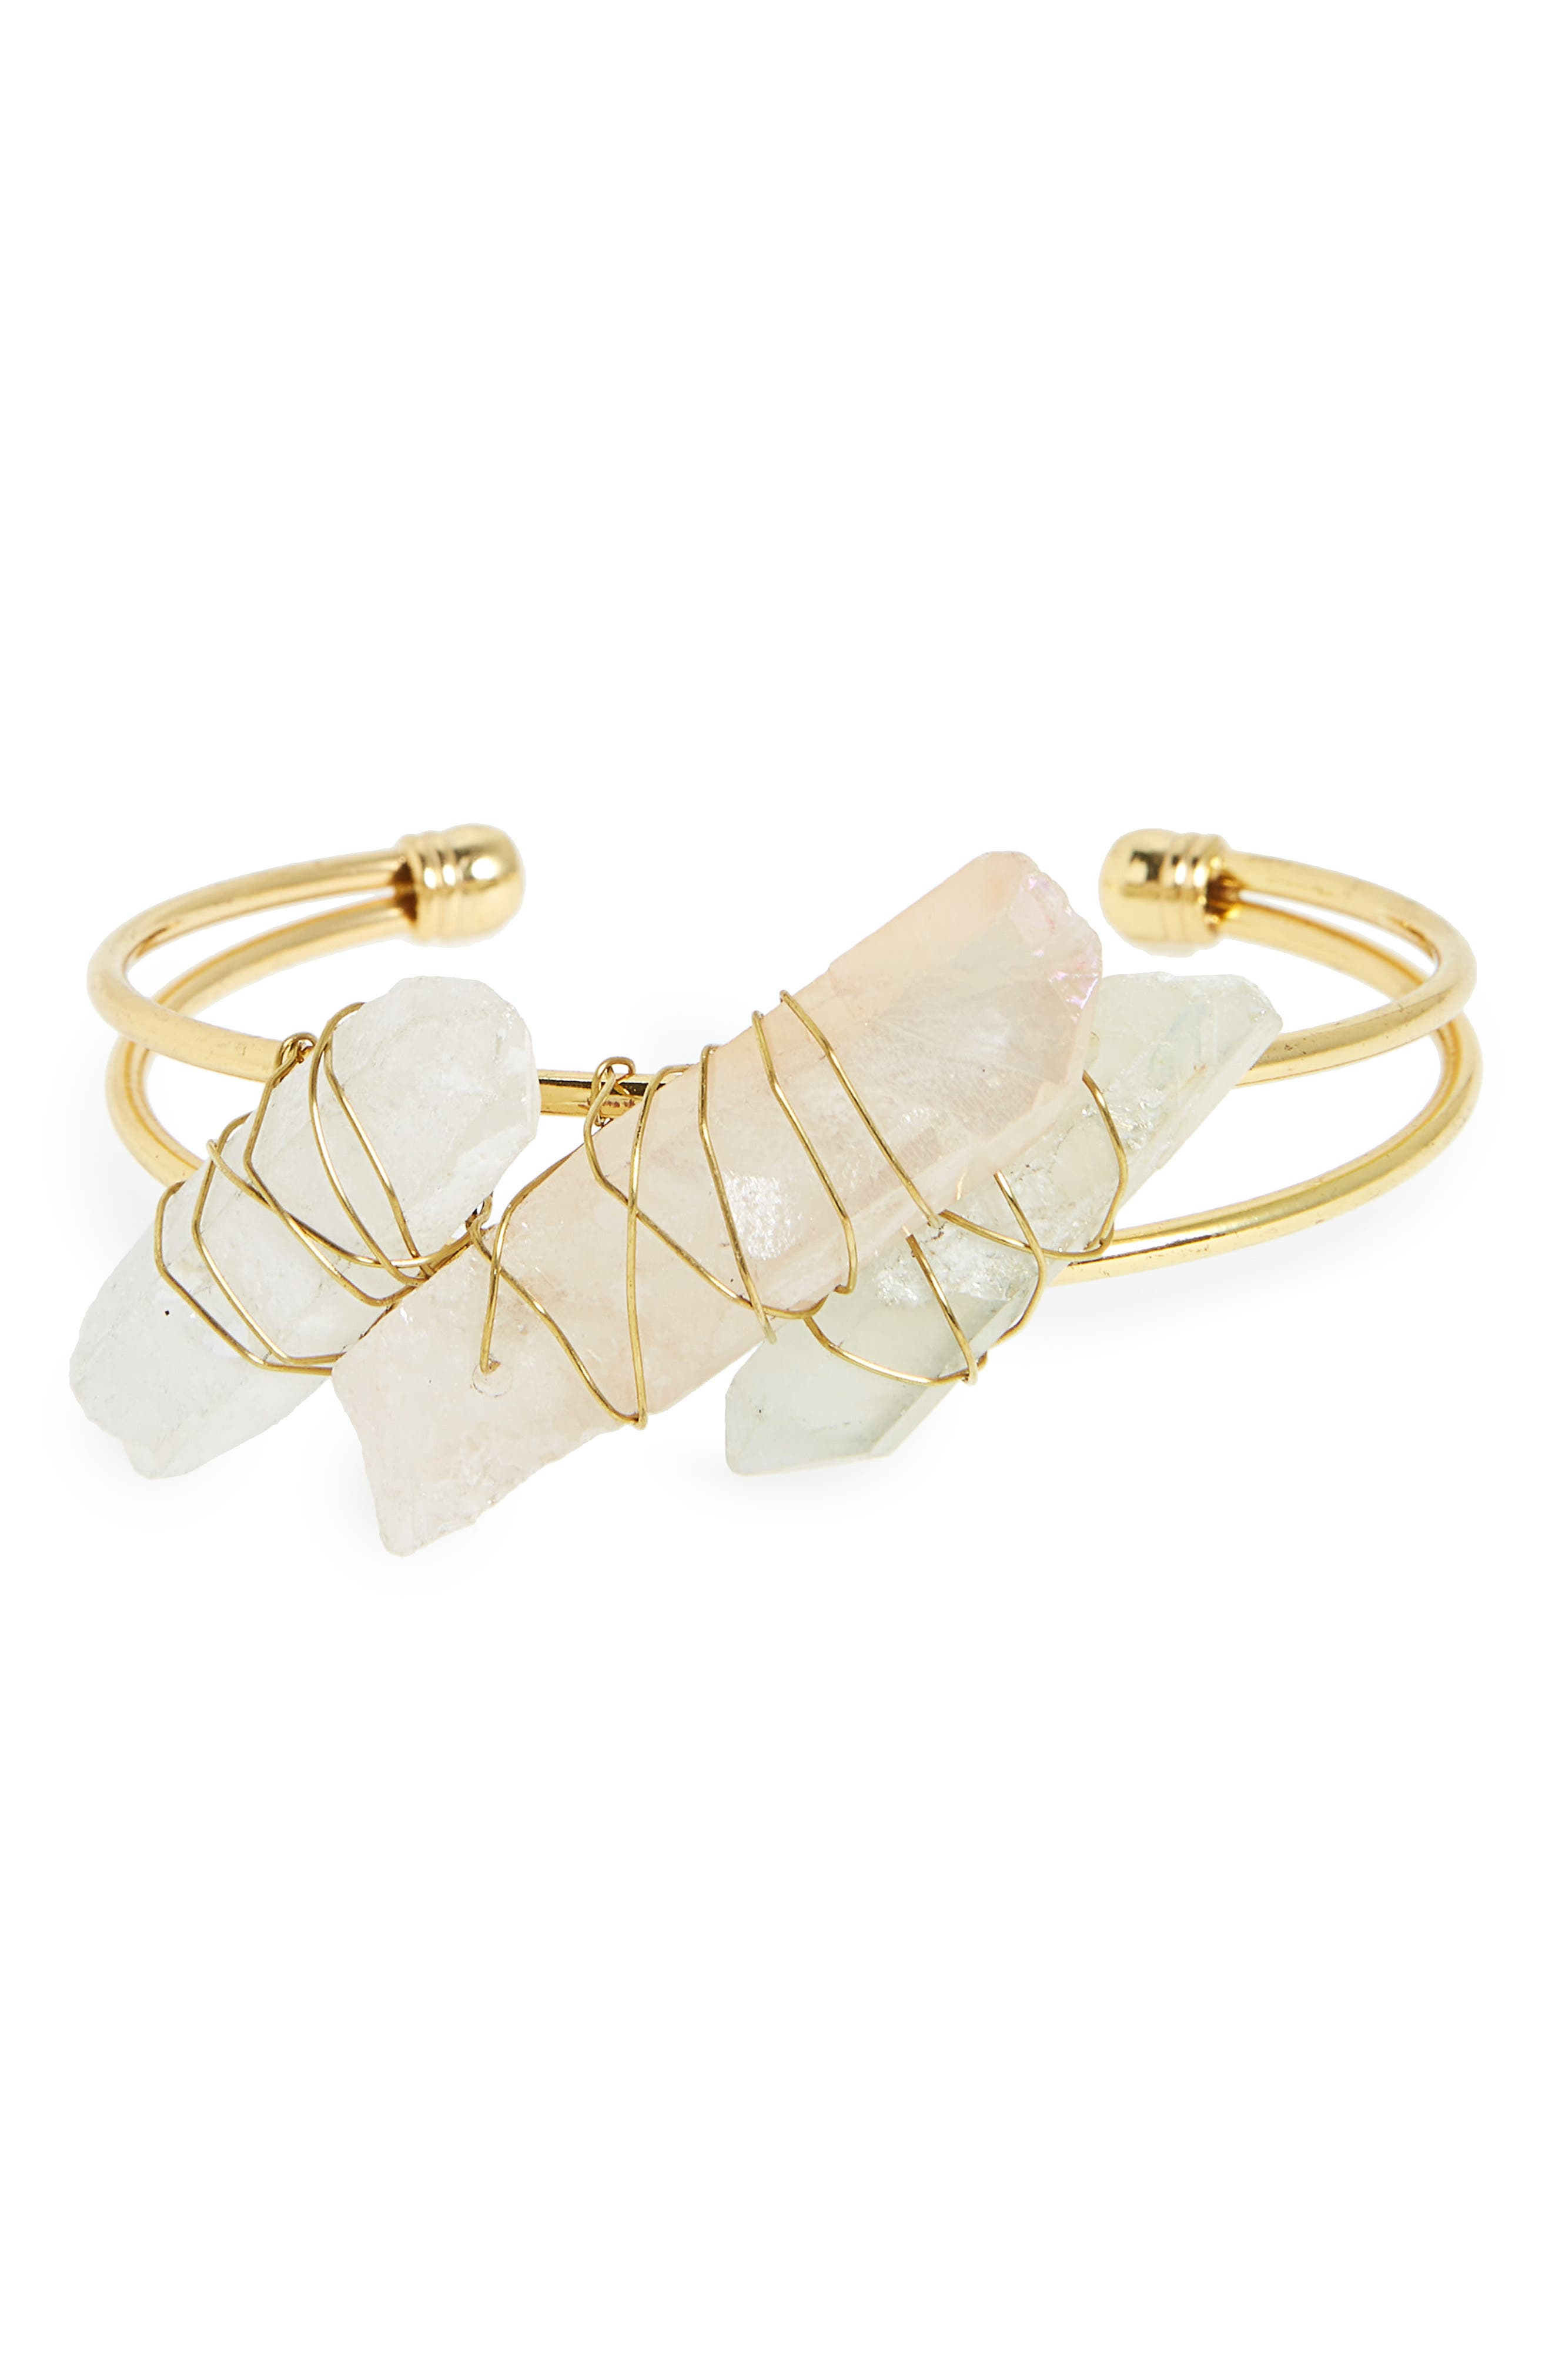 Pyrite Cuff Bracelet,                         Main,                         color,